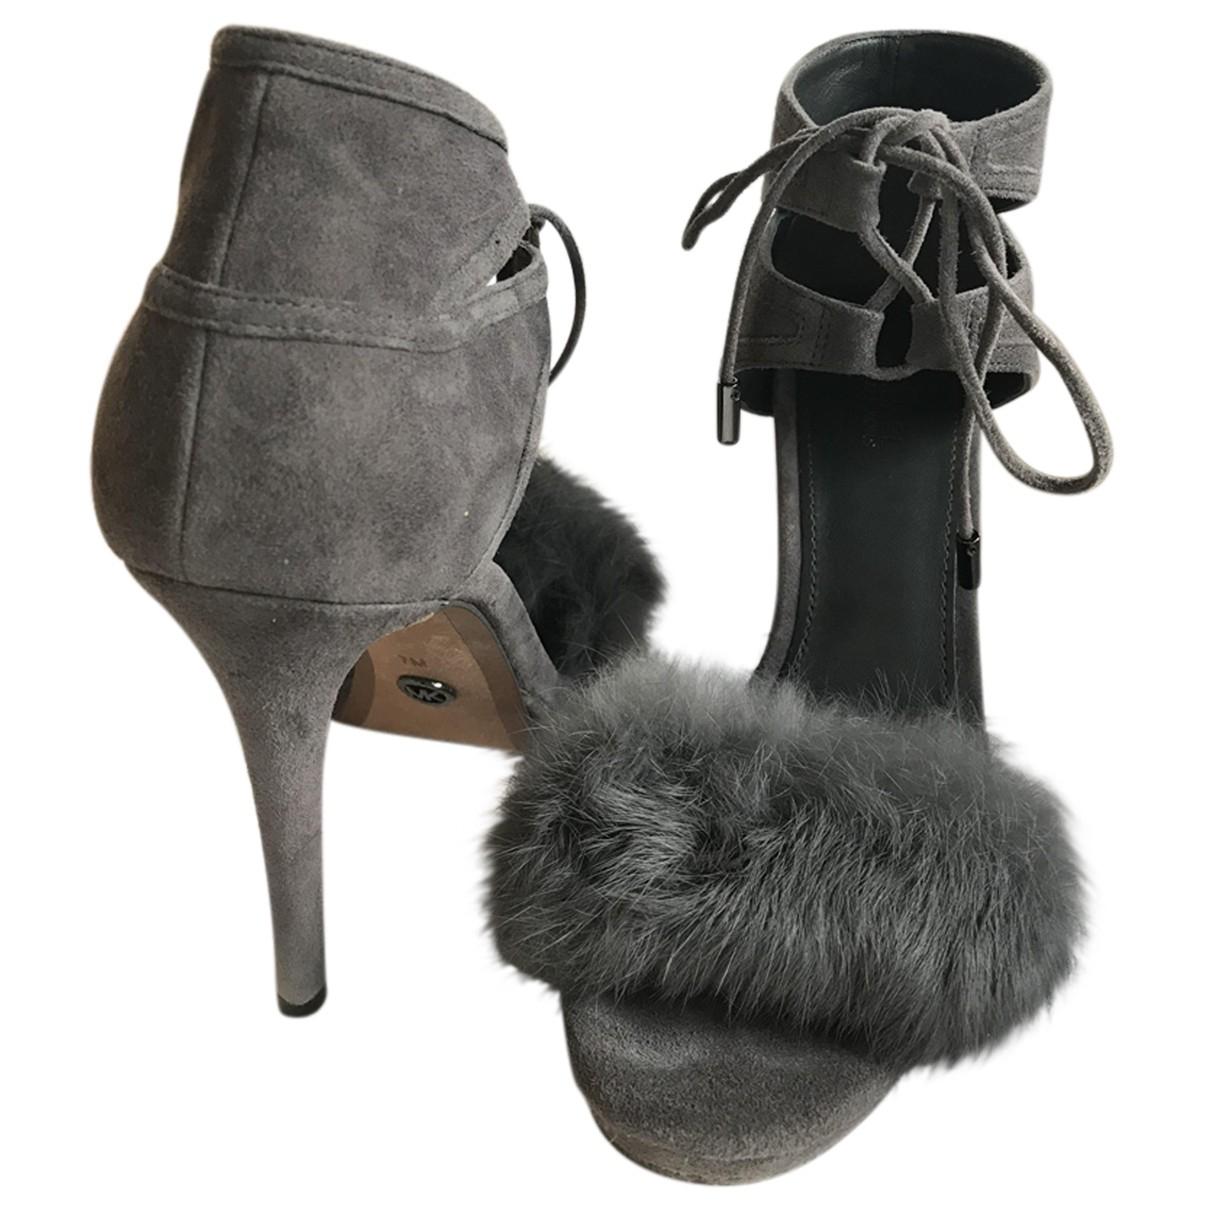 Michael Kors N Grey Leather Heels for Women 37 EU